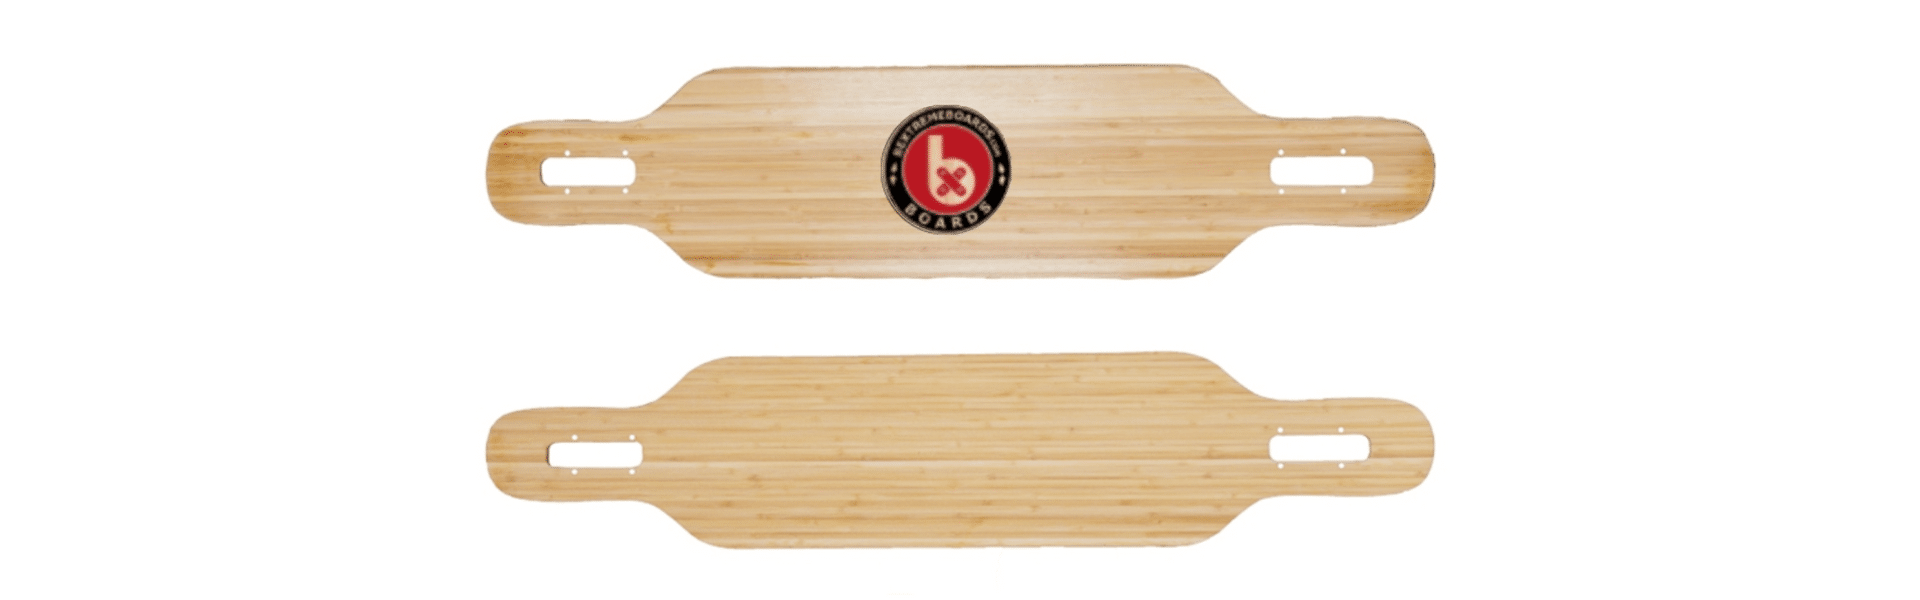 tabla longboard para carving